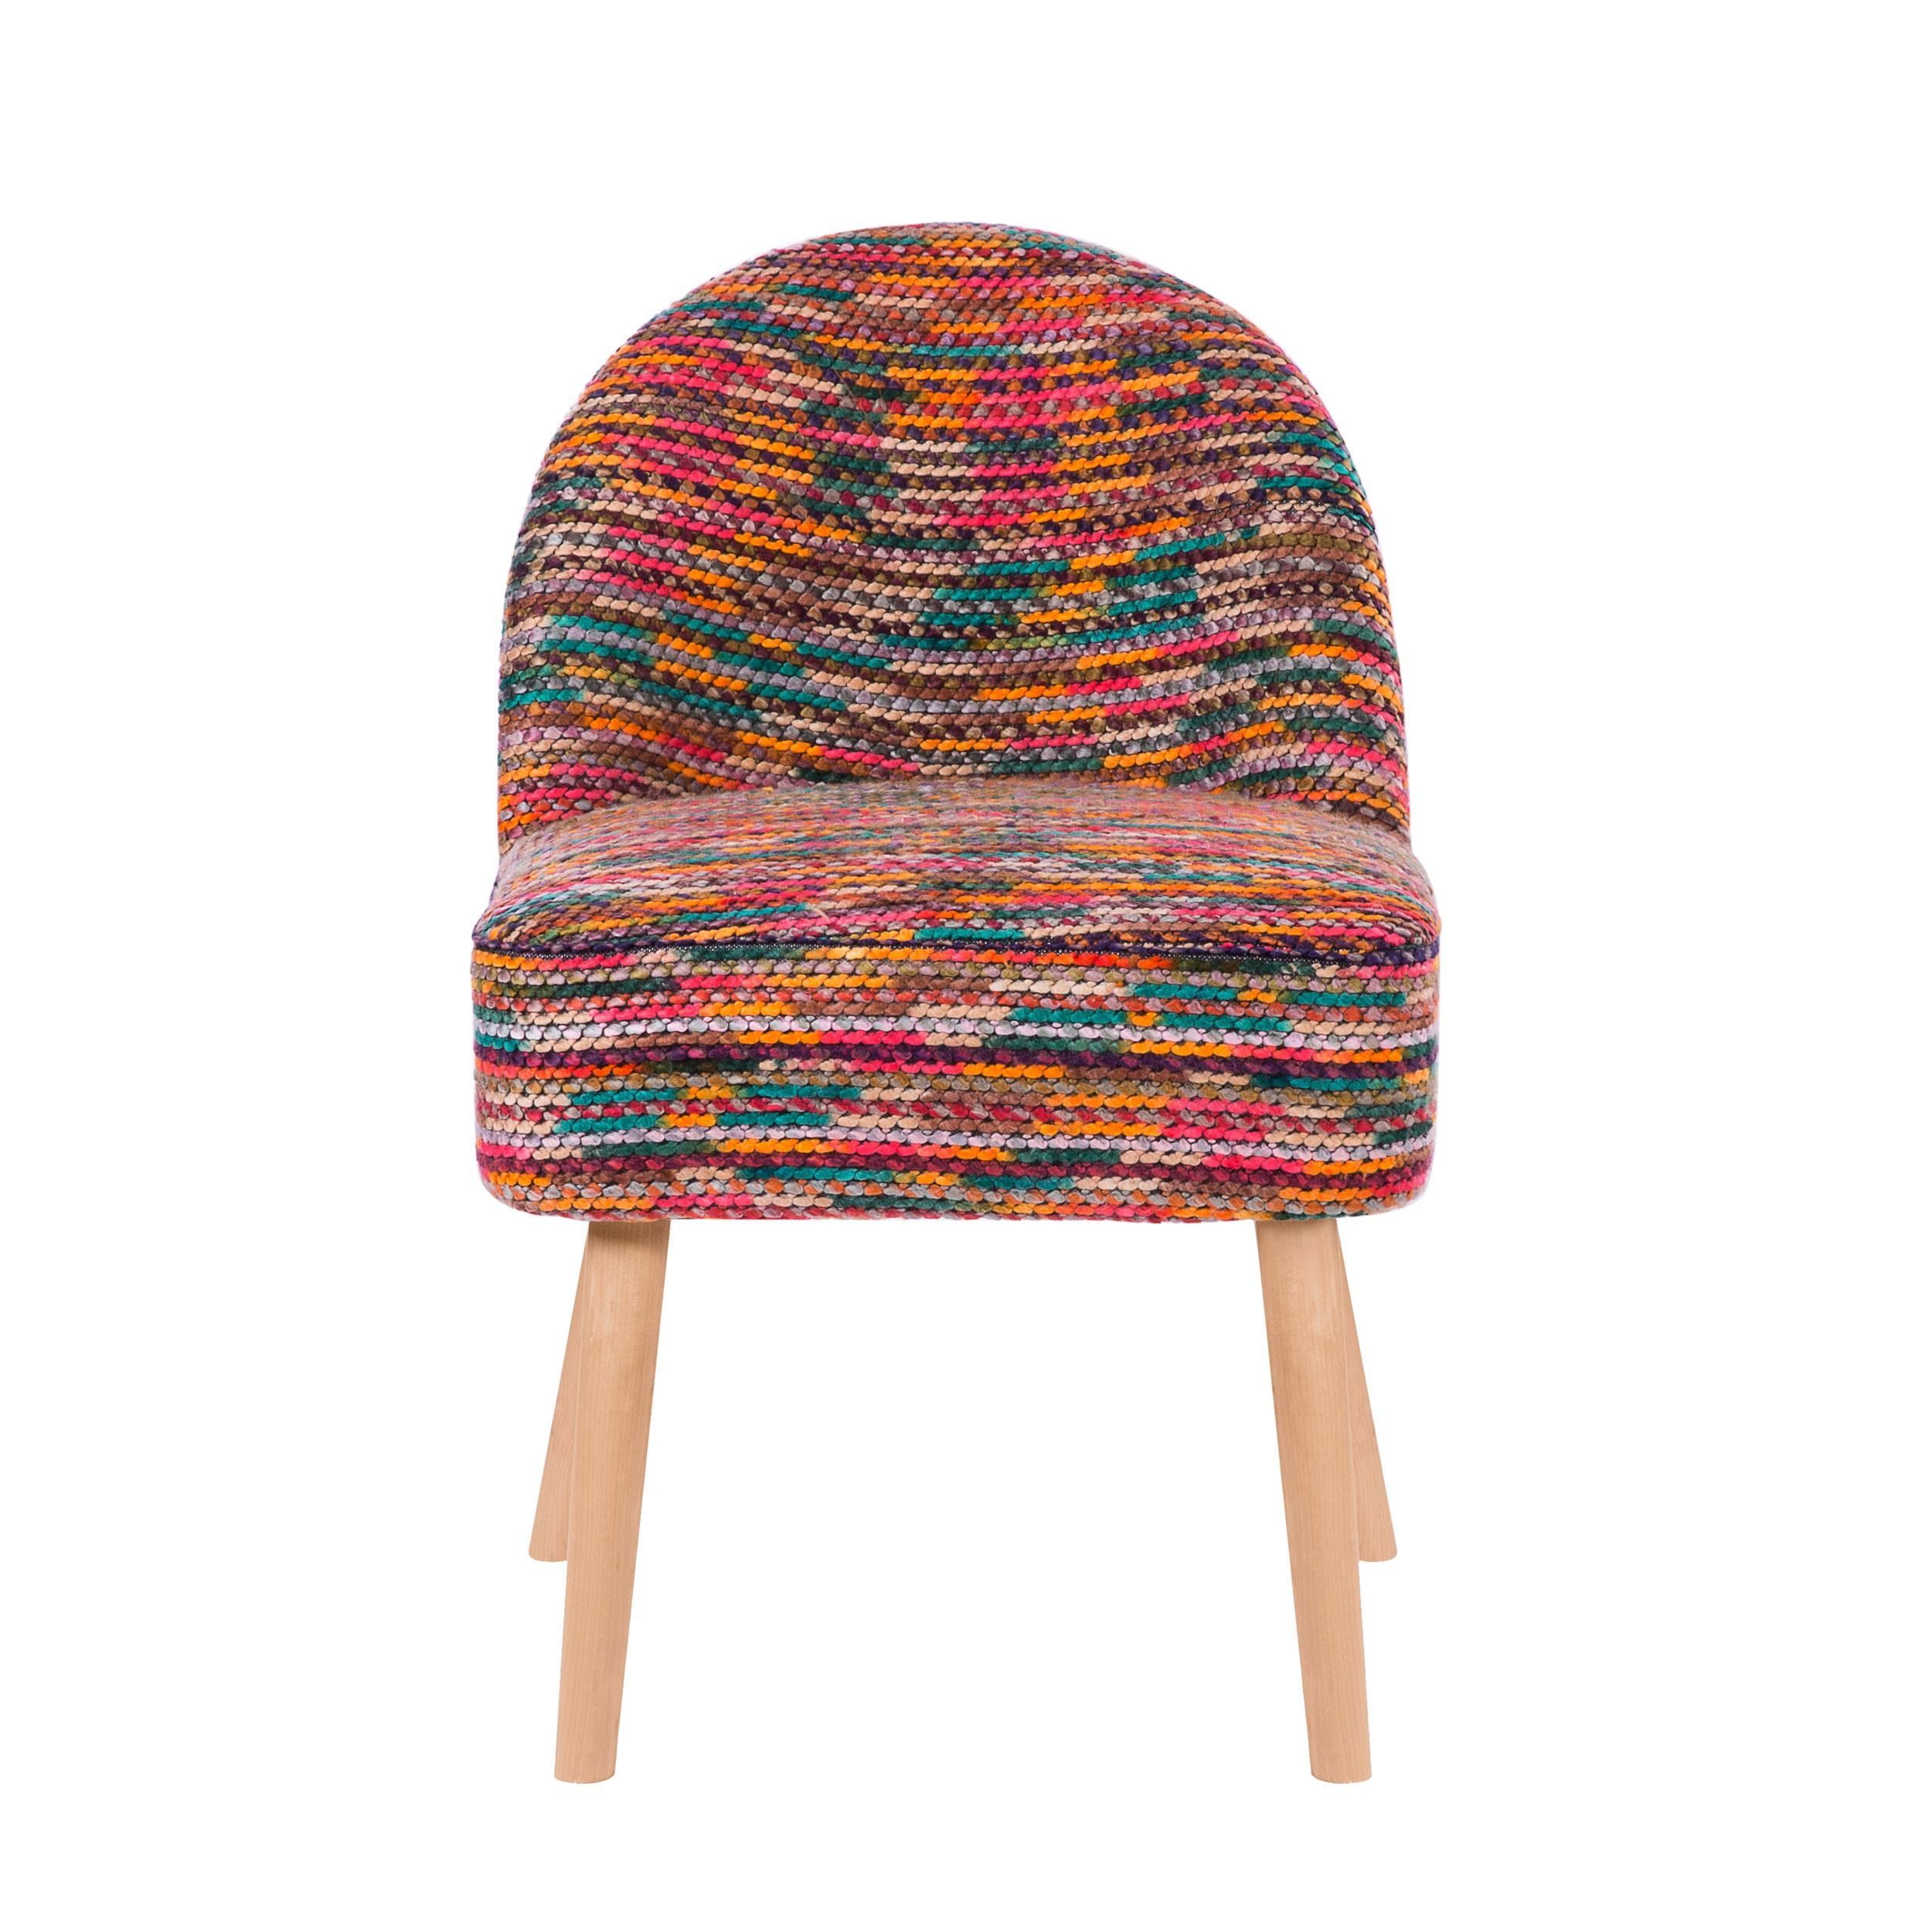 Fauteuil Milo Multicolore Installez Nos Fauteuils Milo - Petit fauteuil scandinave